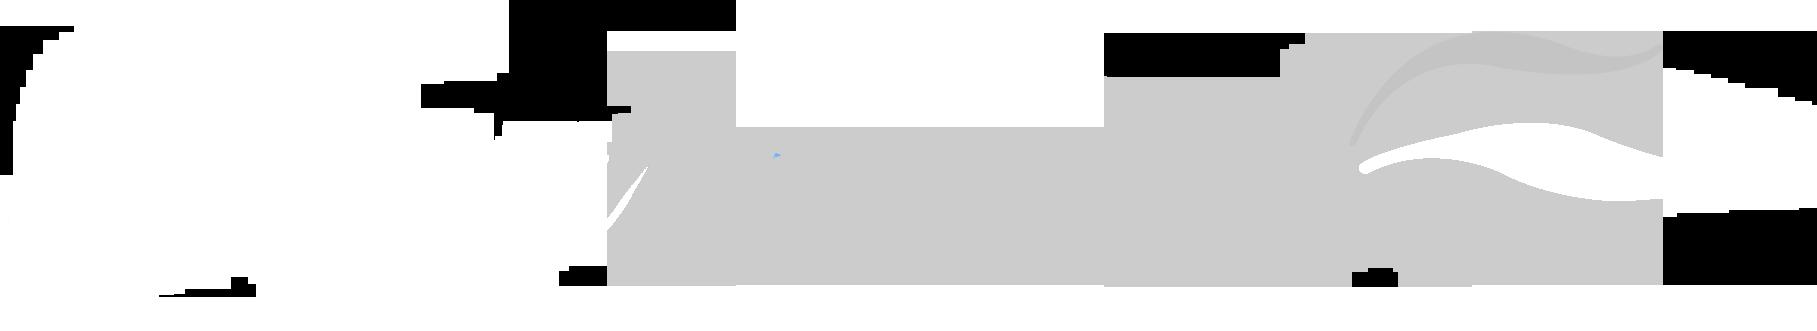 Martesano